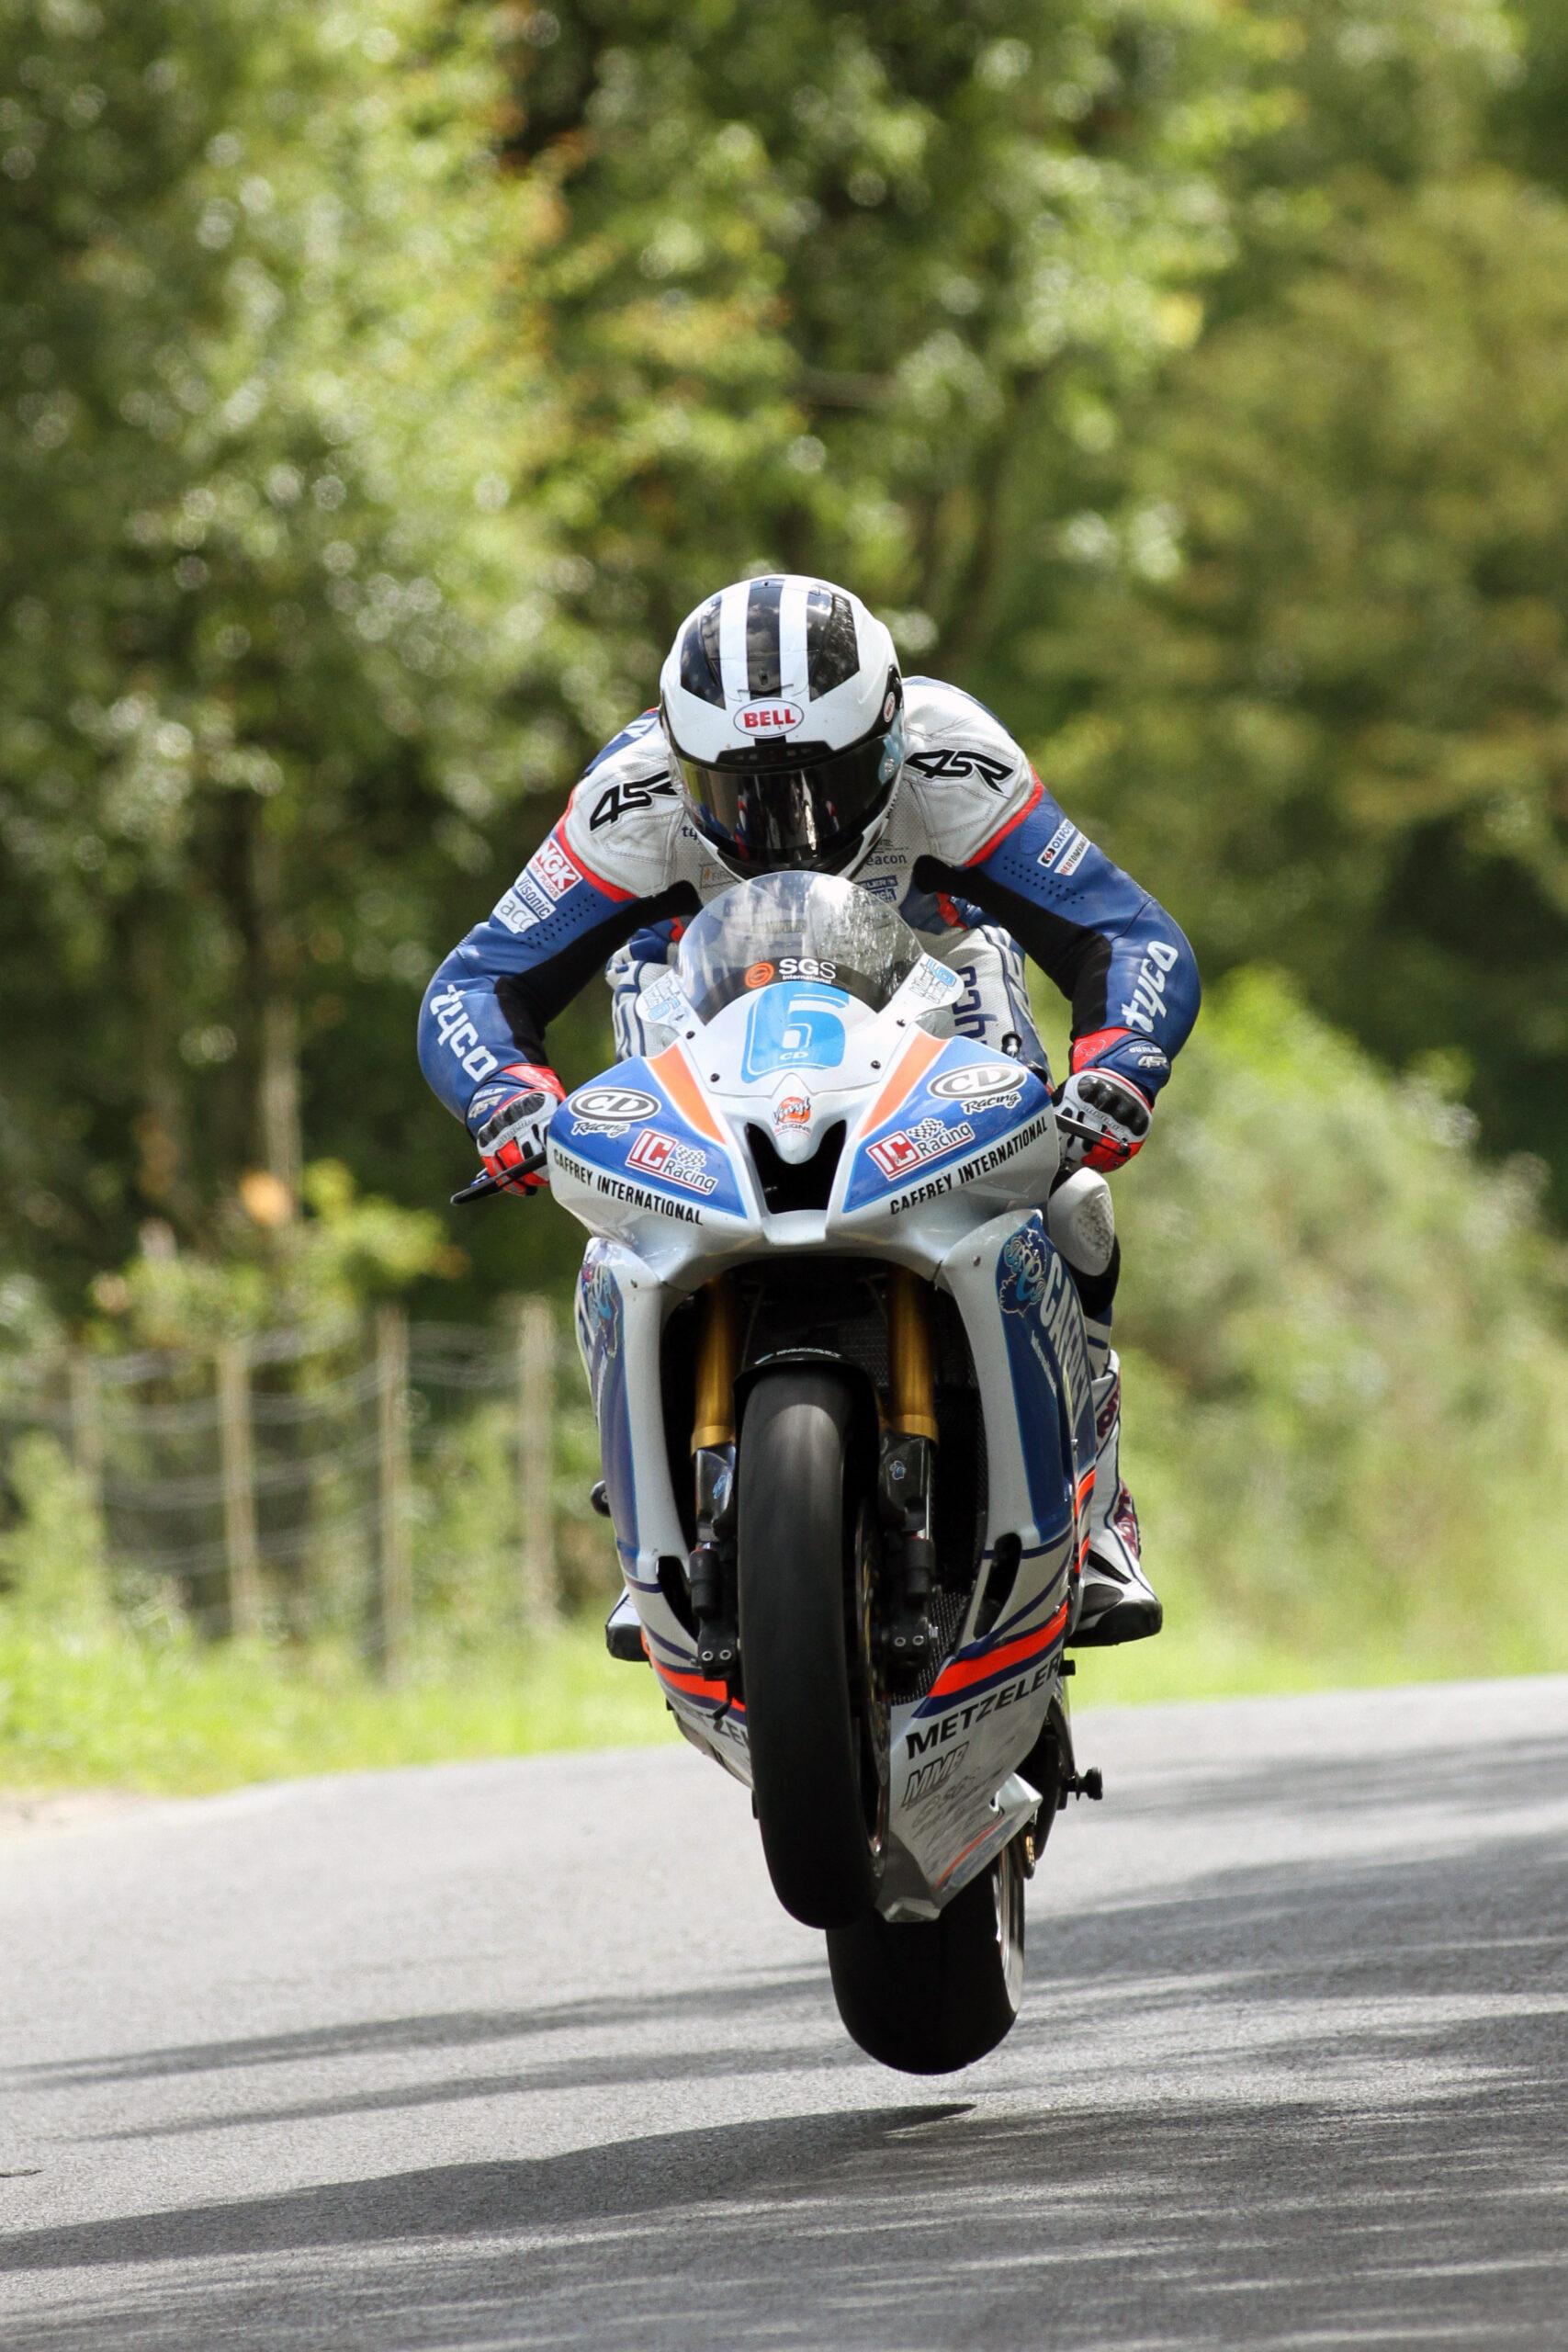 William Dunlop – 2015 Irish Road Race Supersport Champion